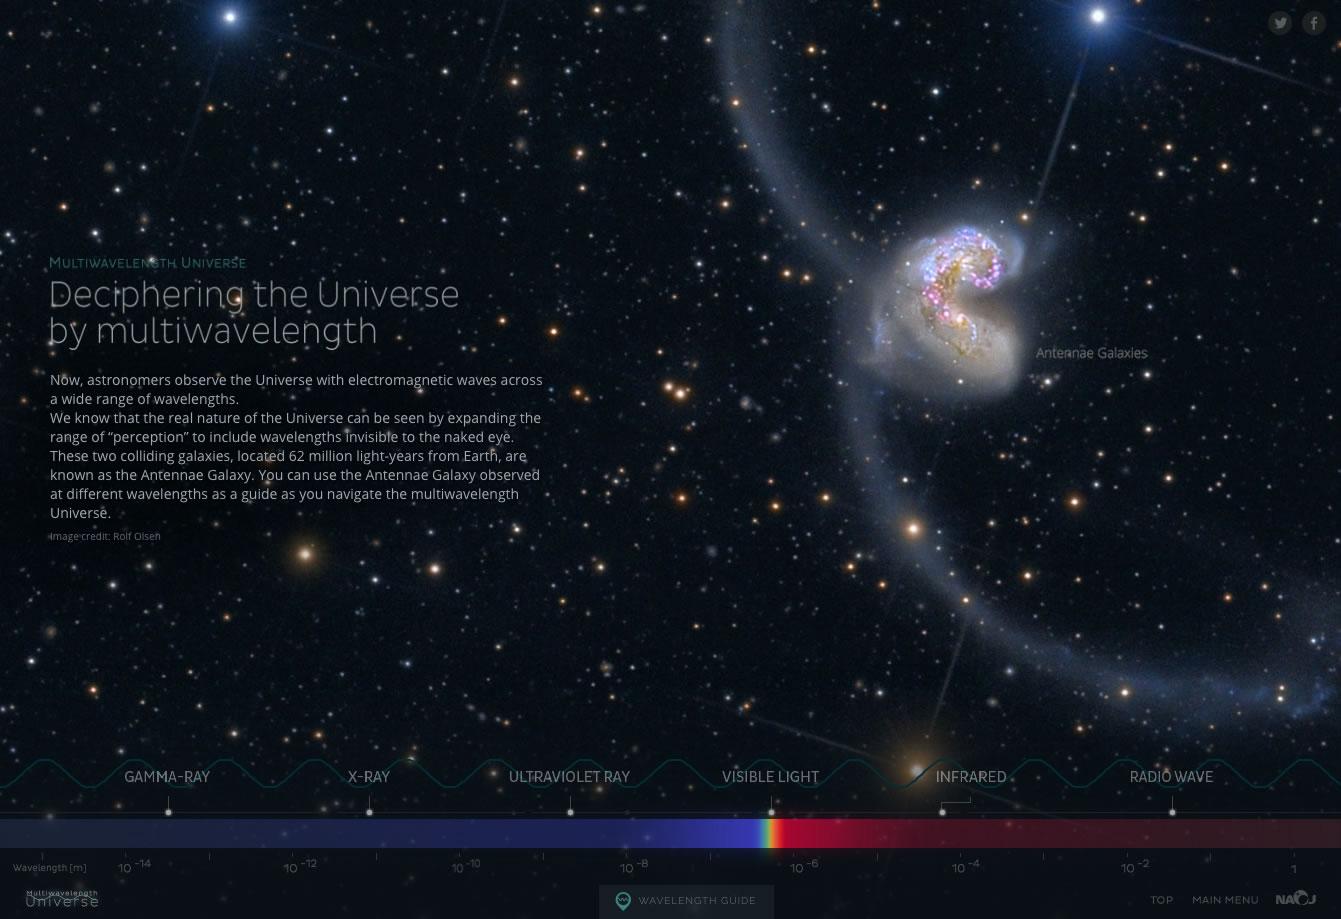 Multiwavelength Universe image